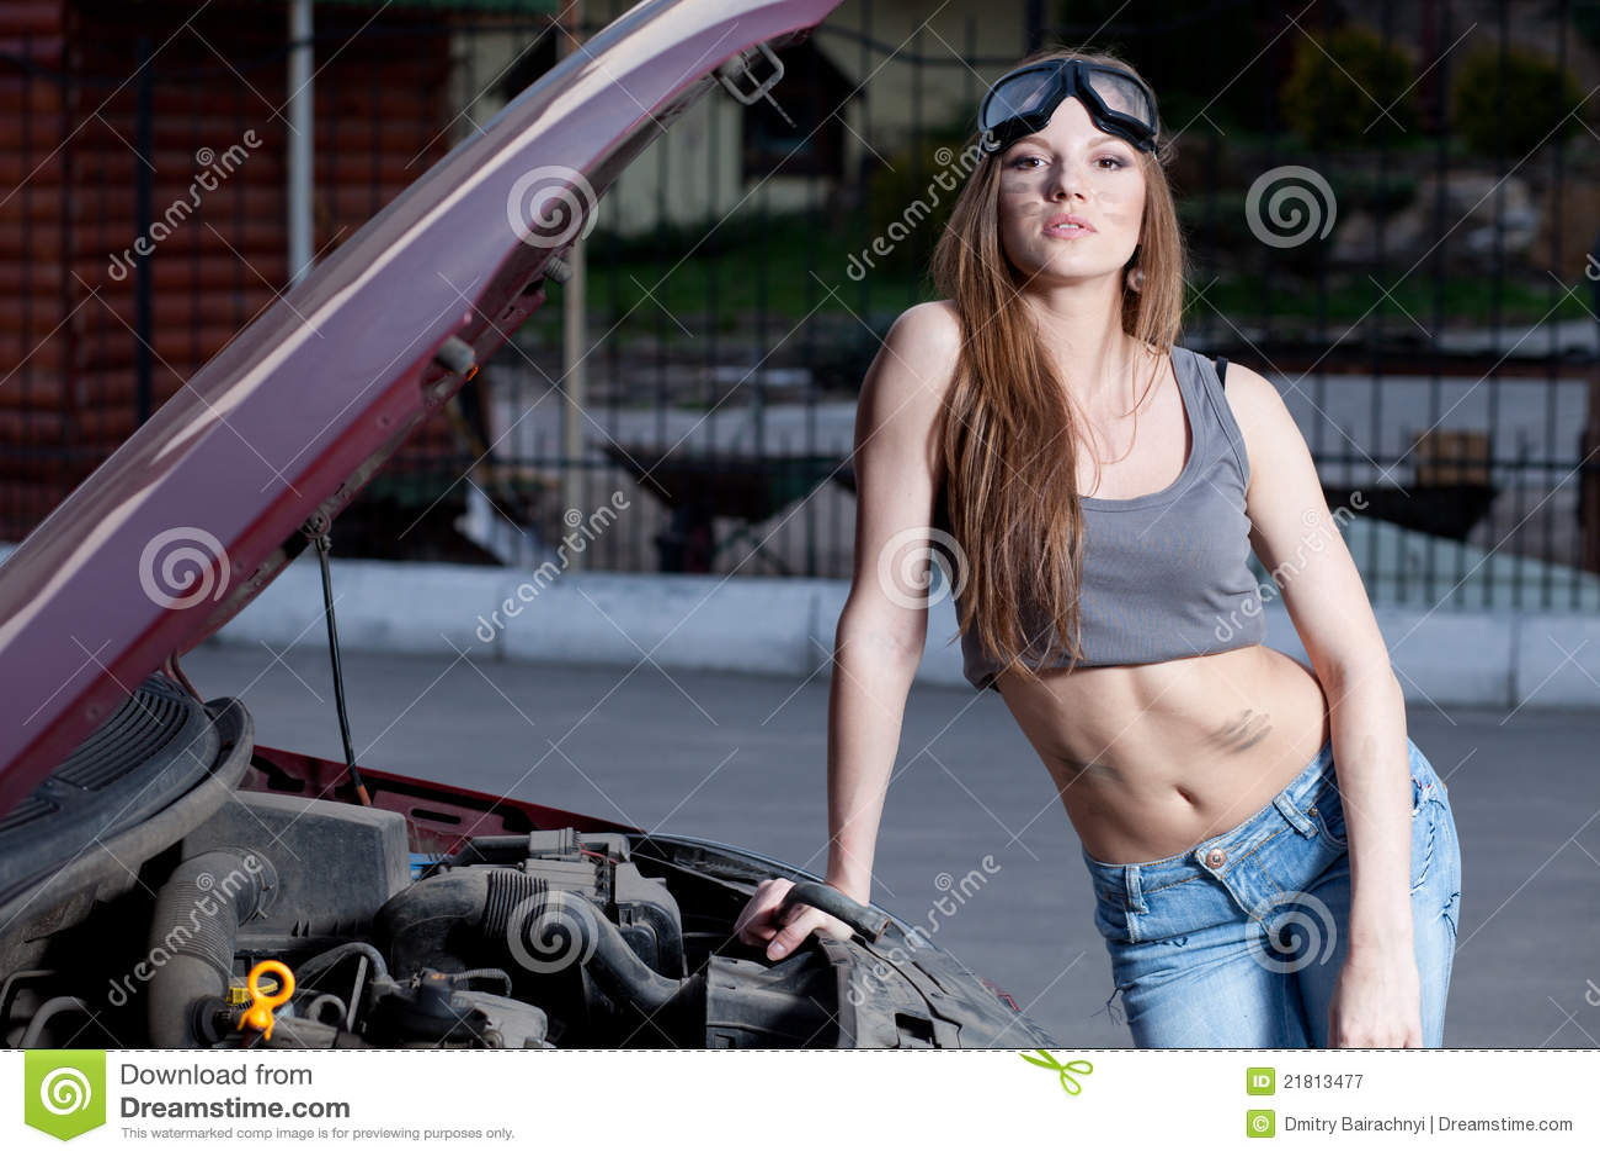 M Car Care Near Me